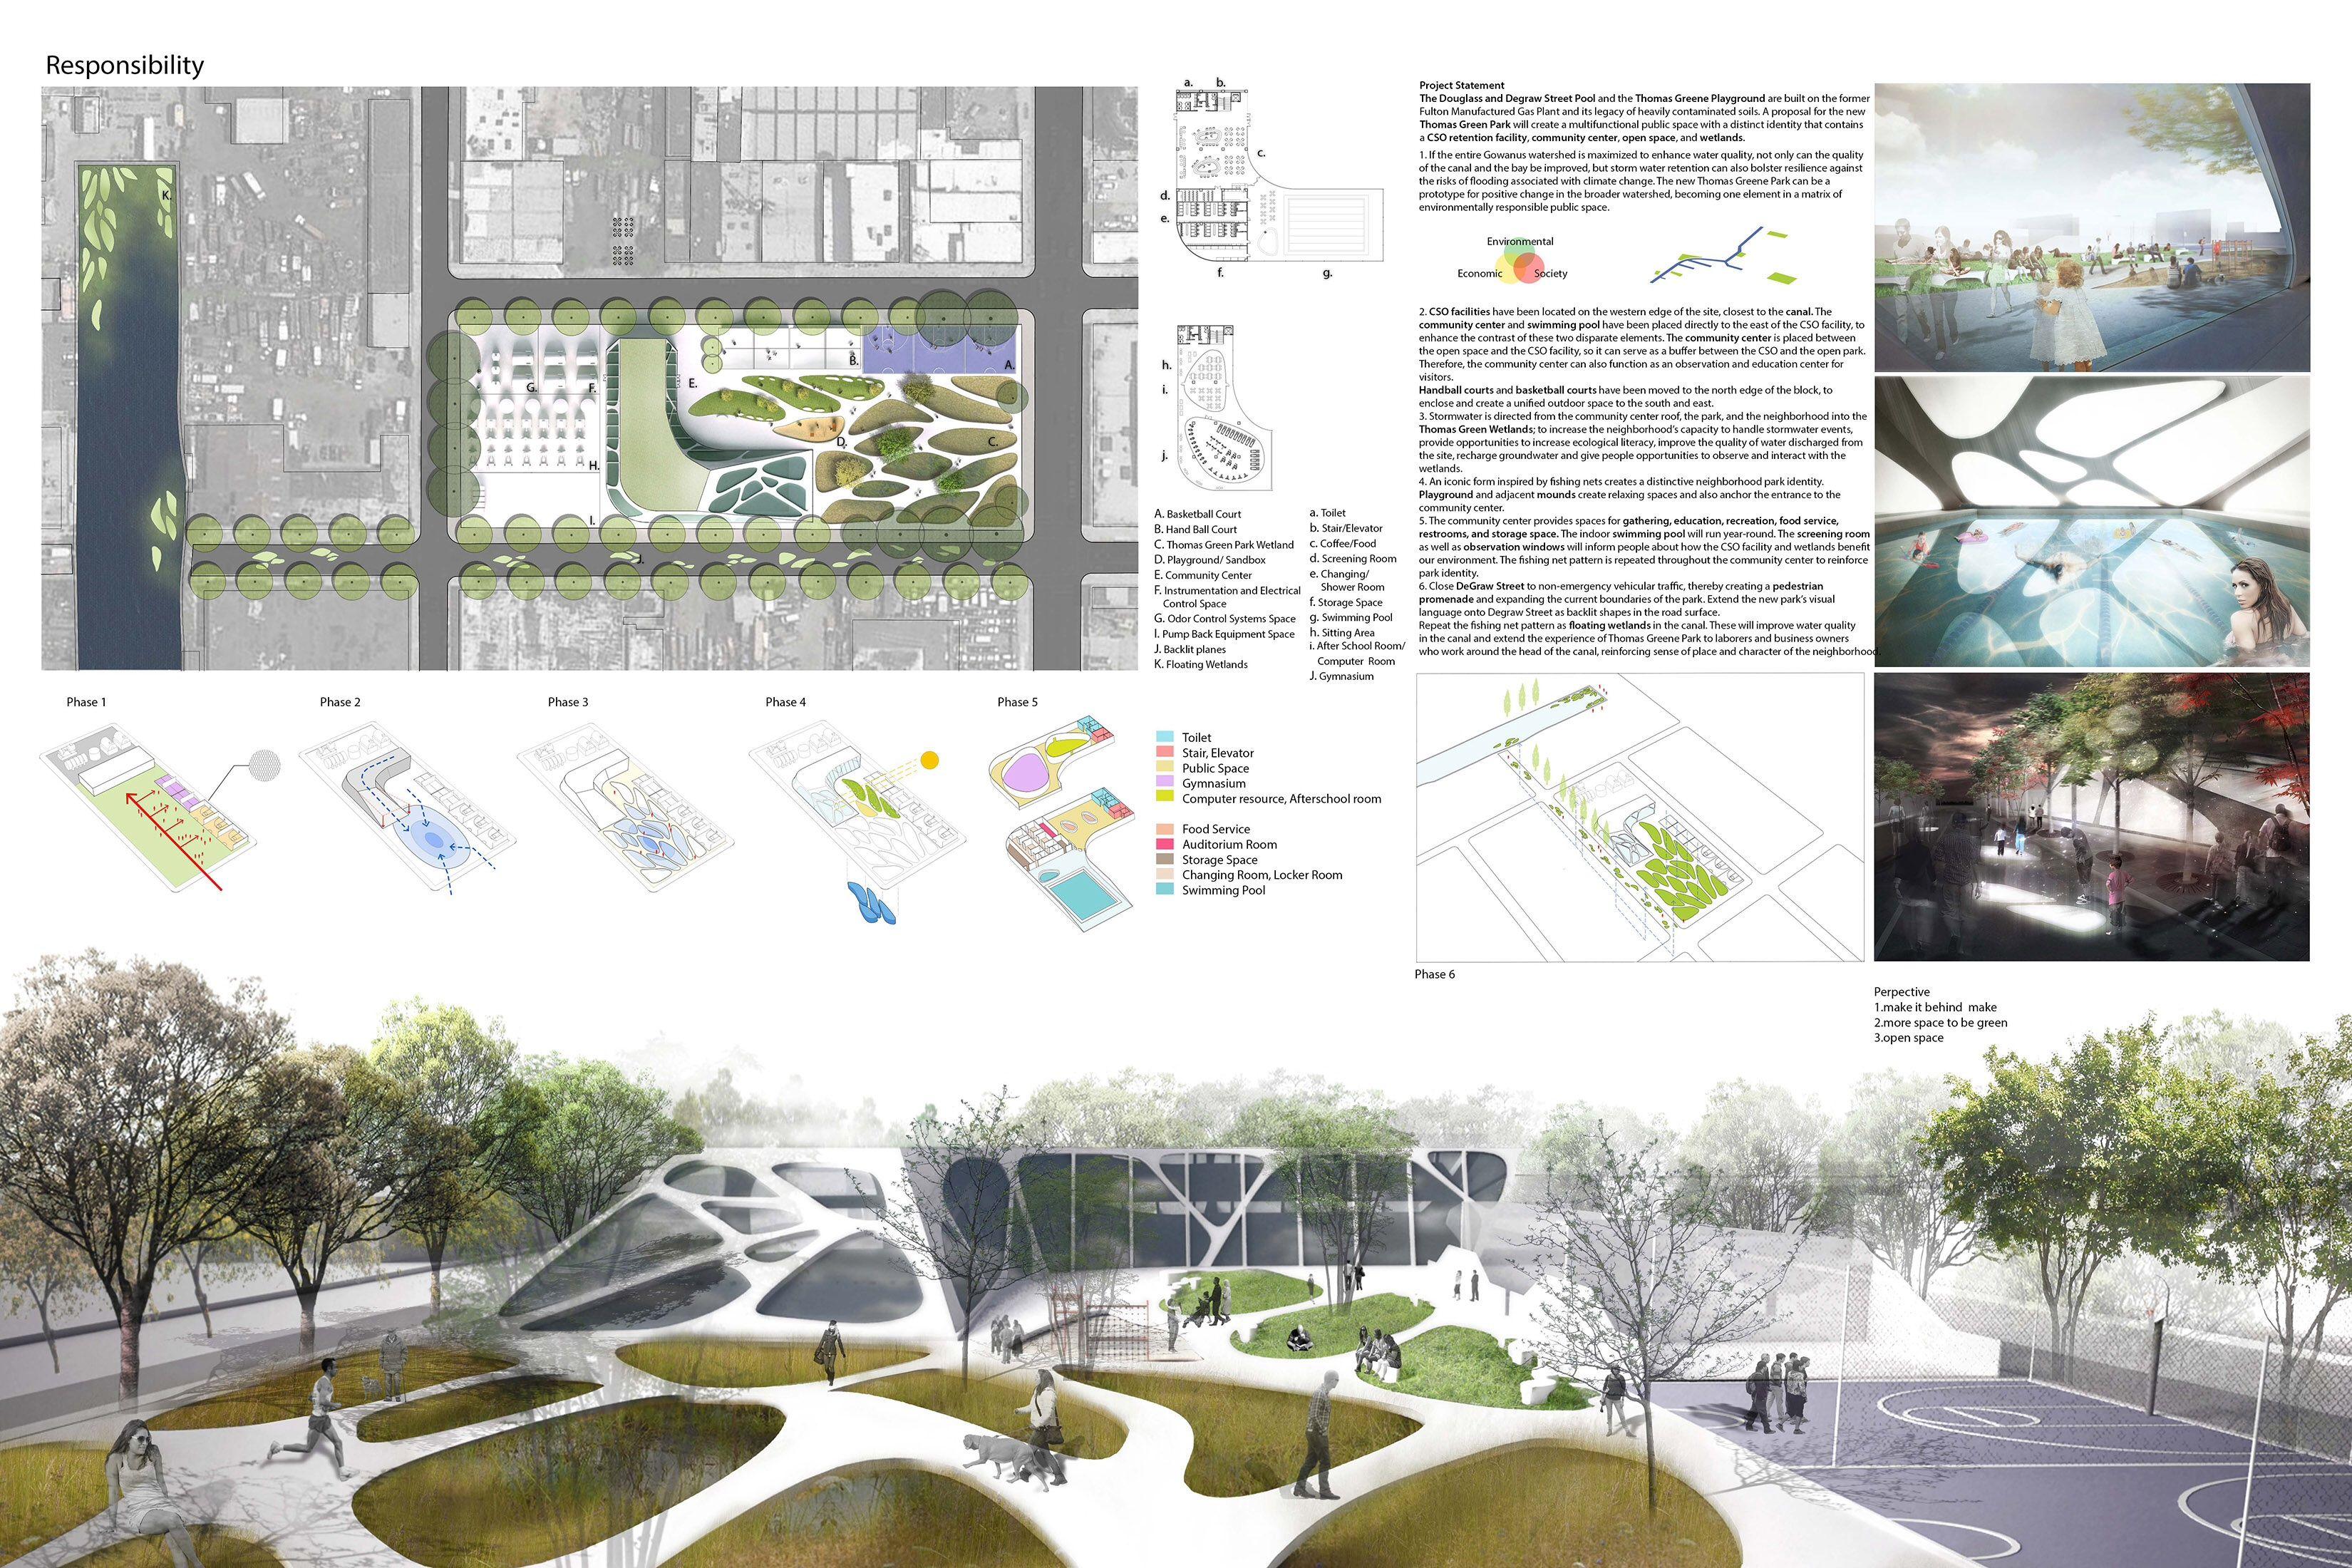 Poster Layout 5 | Landscape design competition, Landscape ...